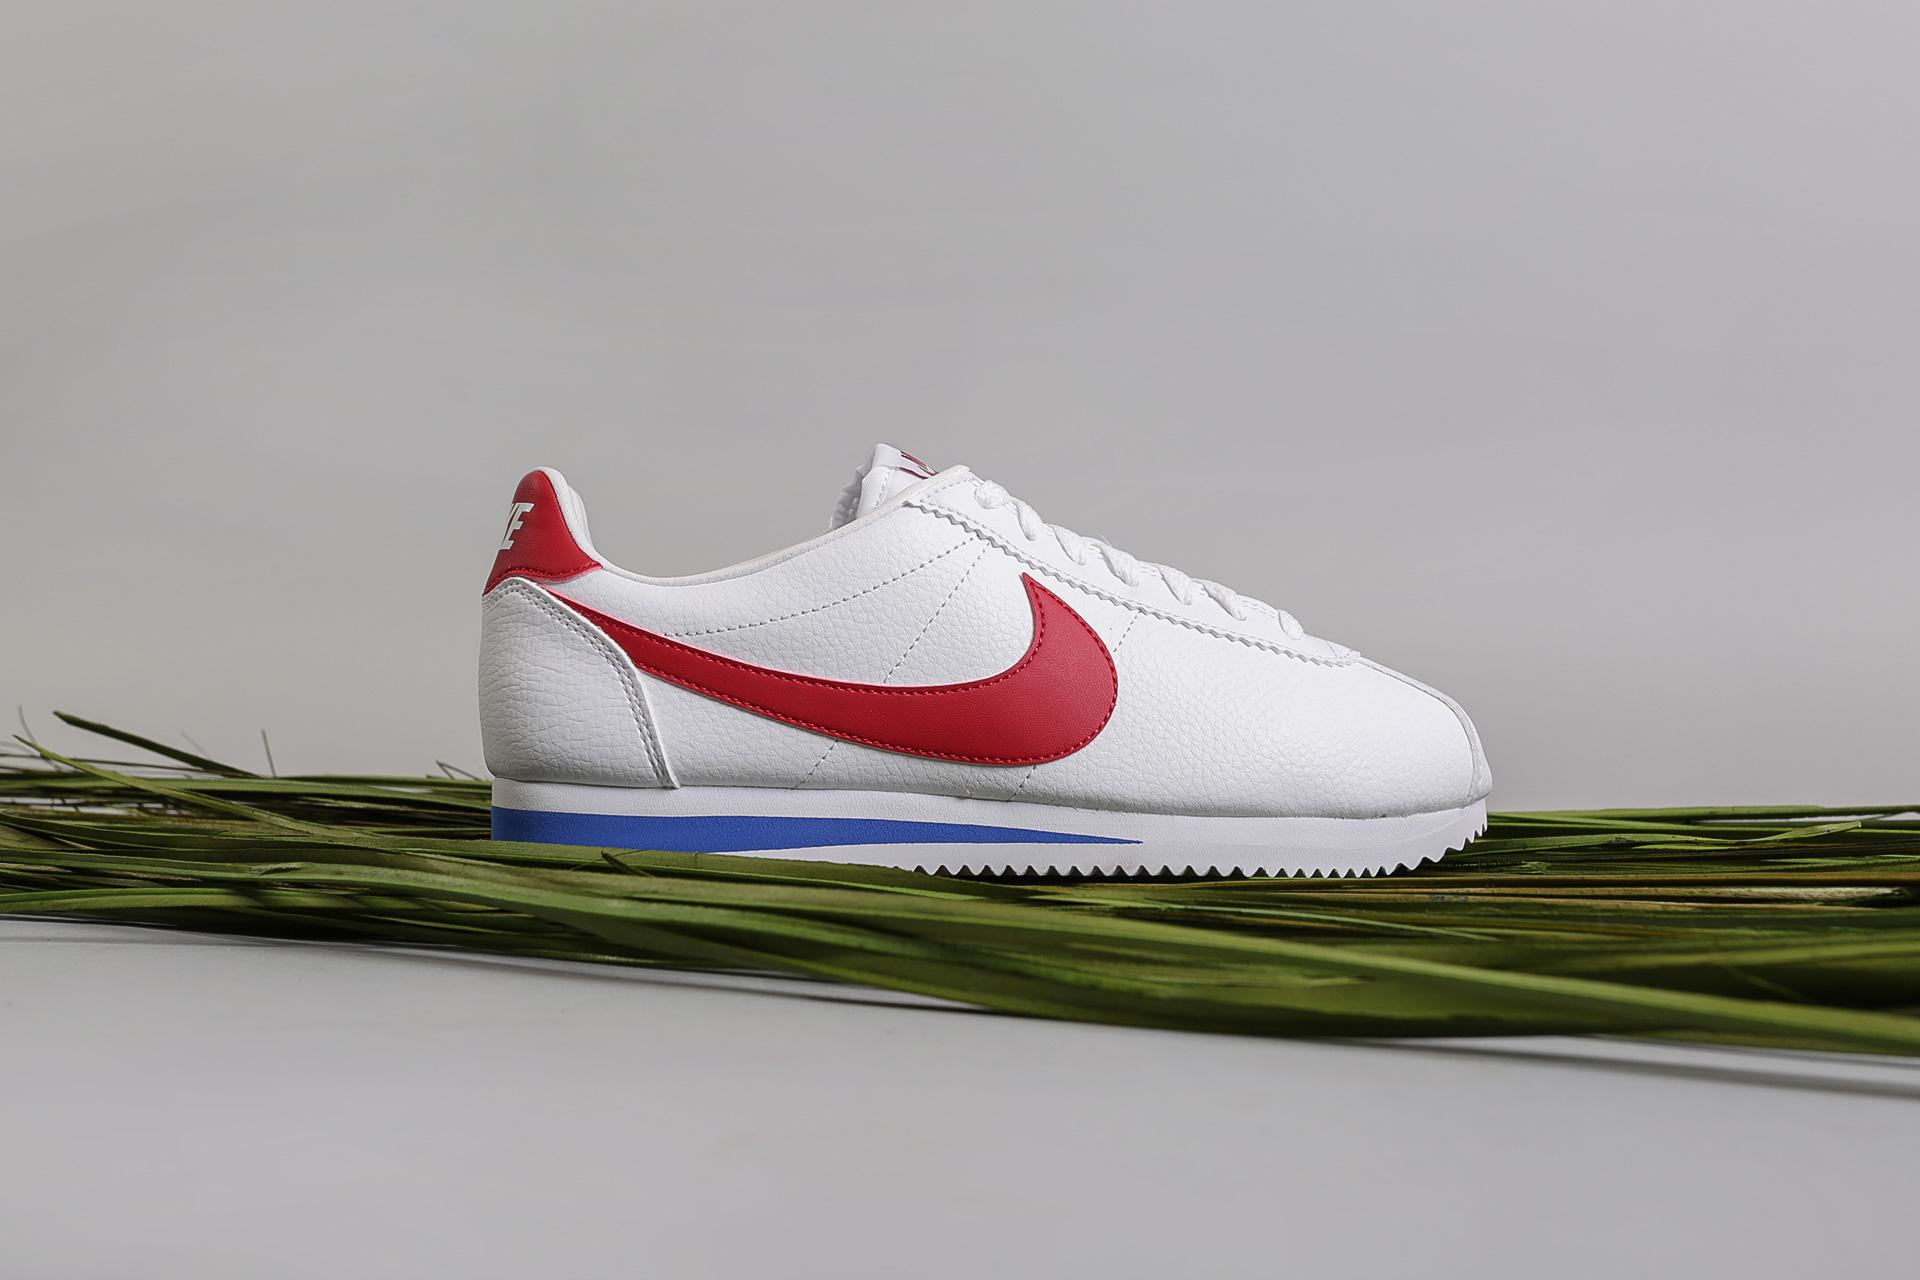 385b4aa5 Купить белые мужские кроссовки Cortez Leather от Nike (749571-154 ...